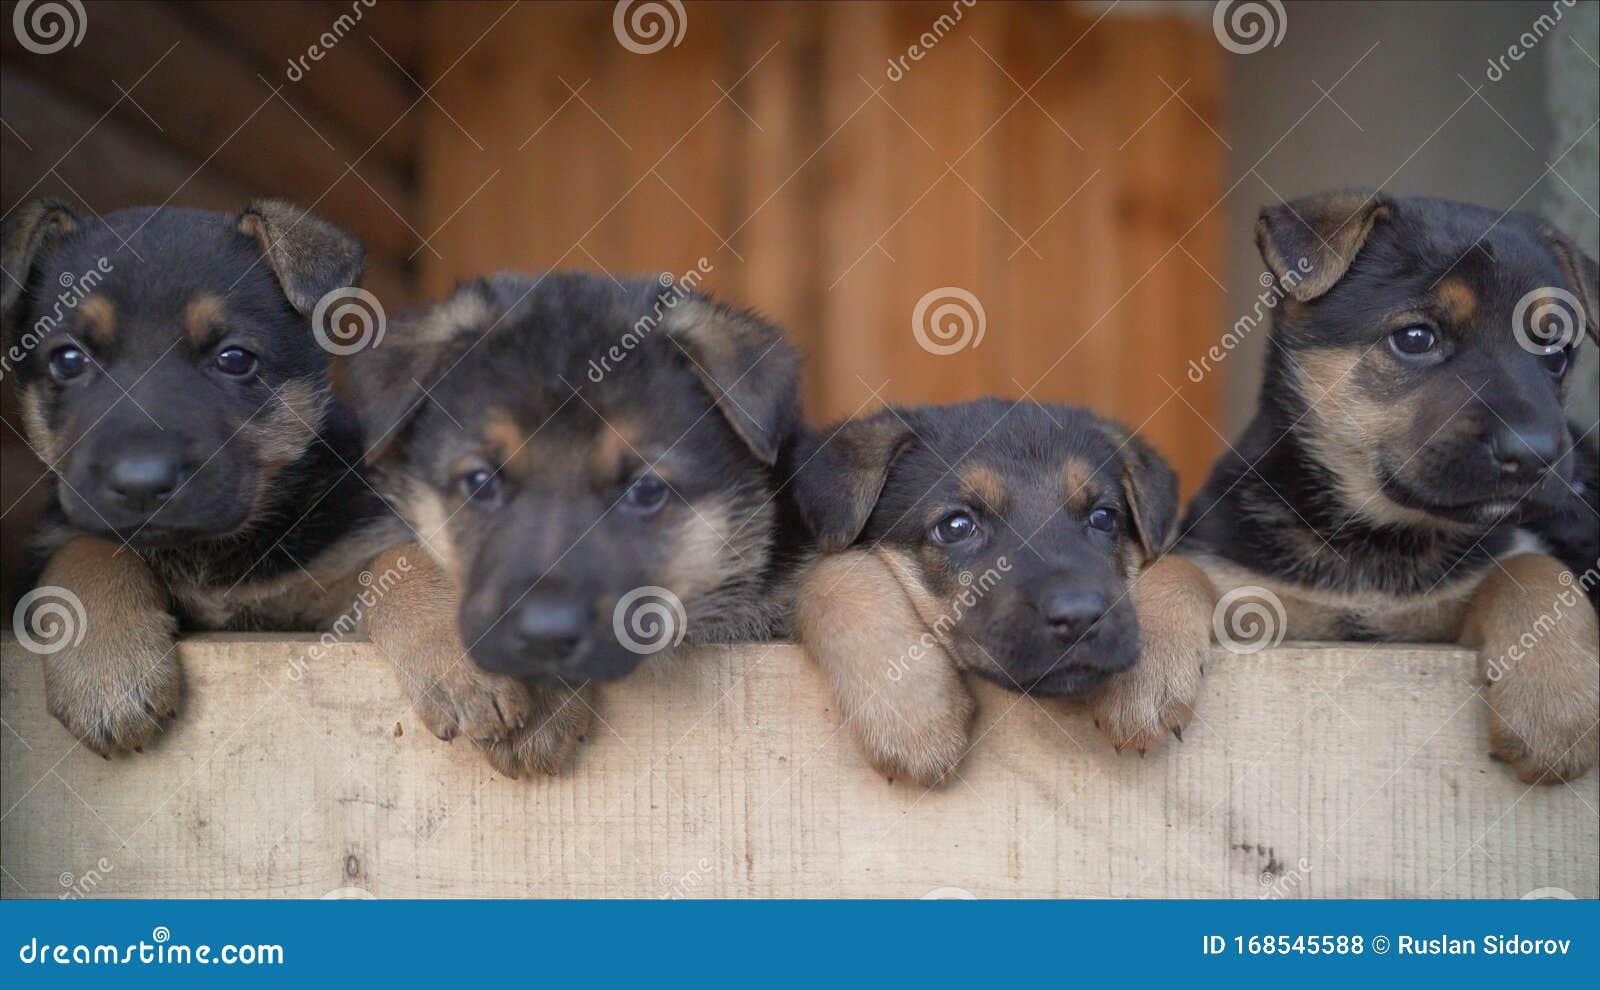 German Shepherd Puppies Many Funny German Shepherd Puppies Head Newborn Puppies Top View Stock Photo Image Of Companion Child 168545588